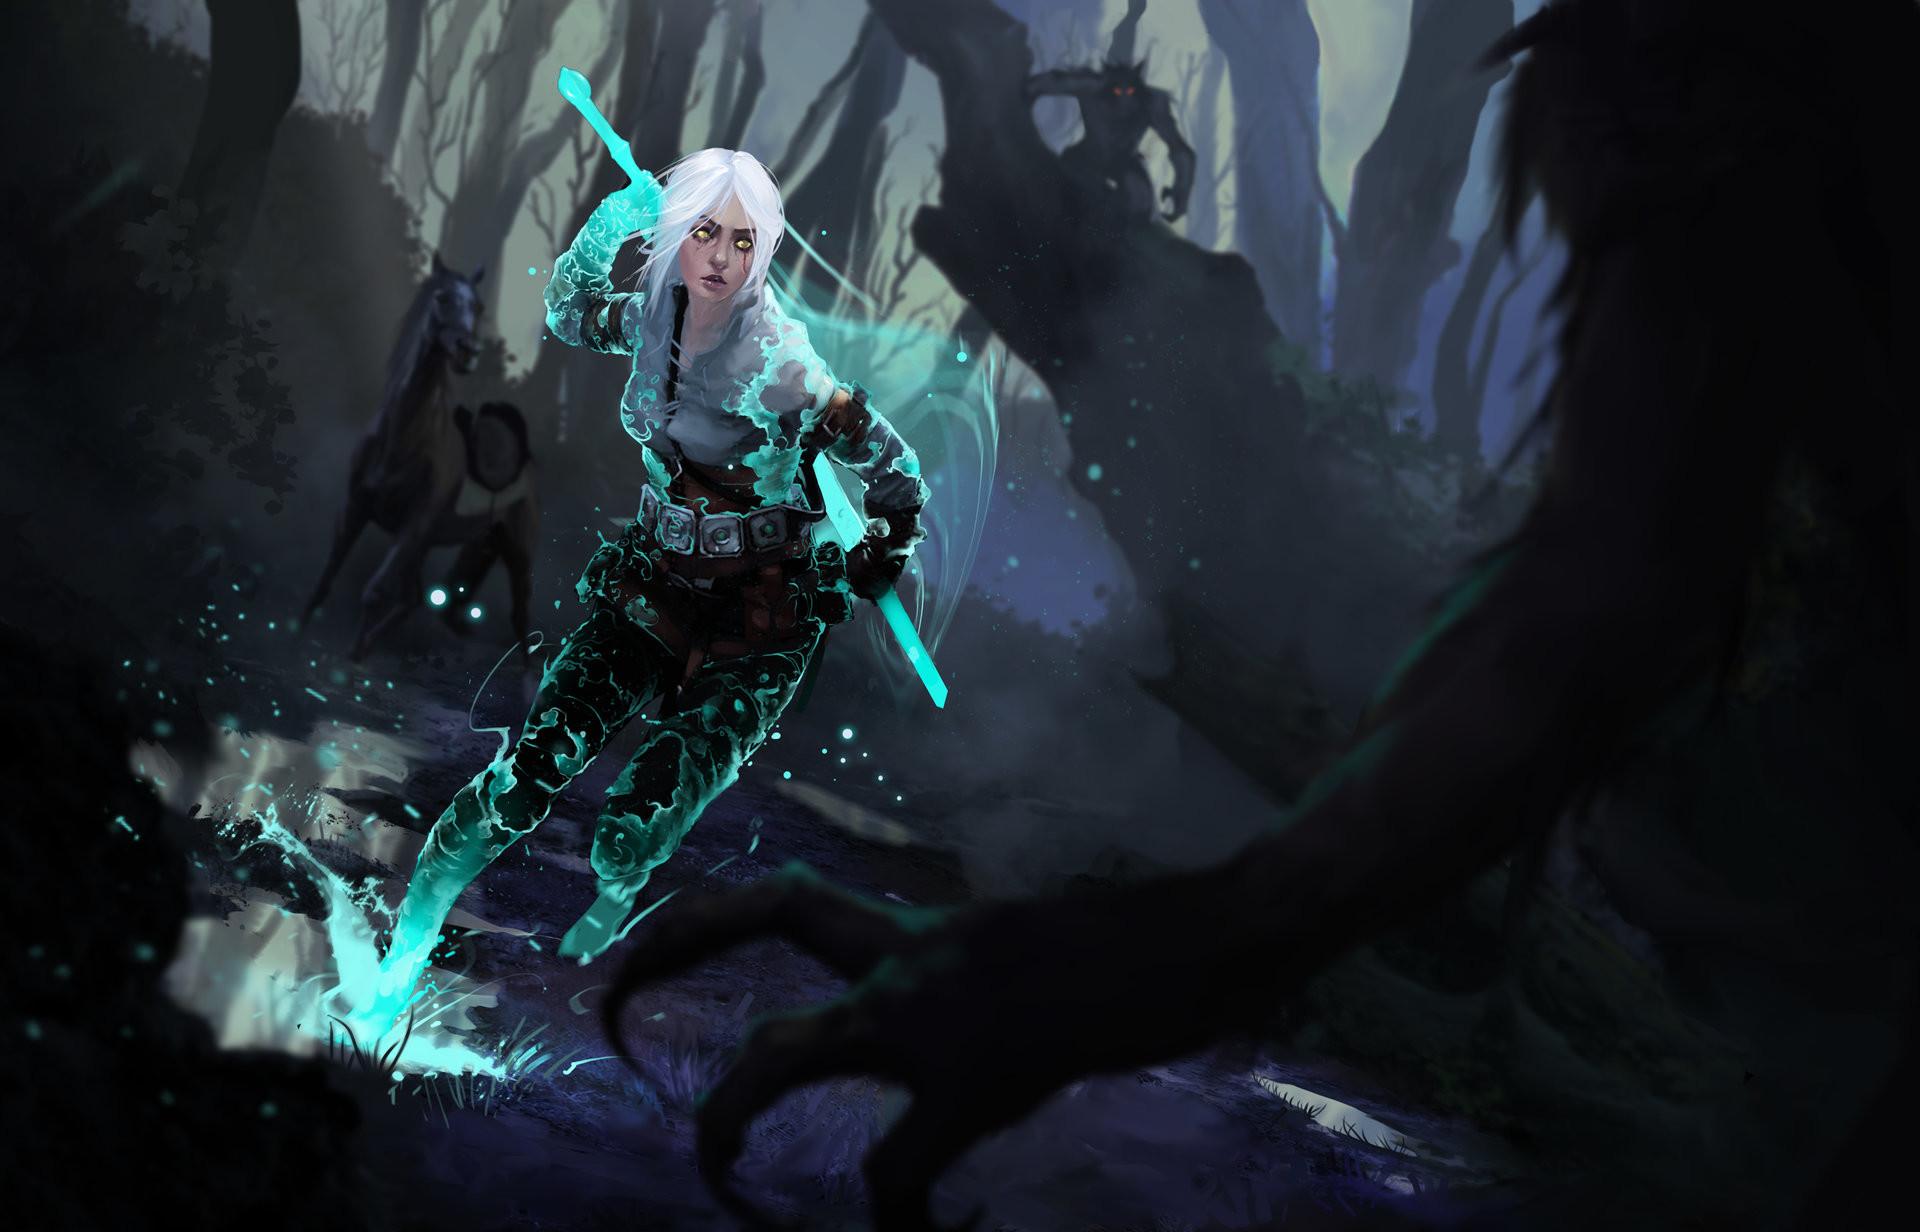 The Witcher 3 Wallpaper Dump